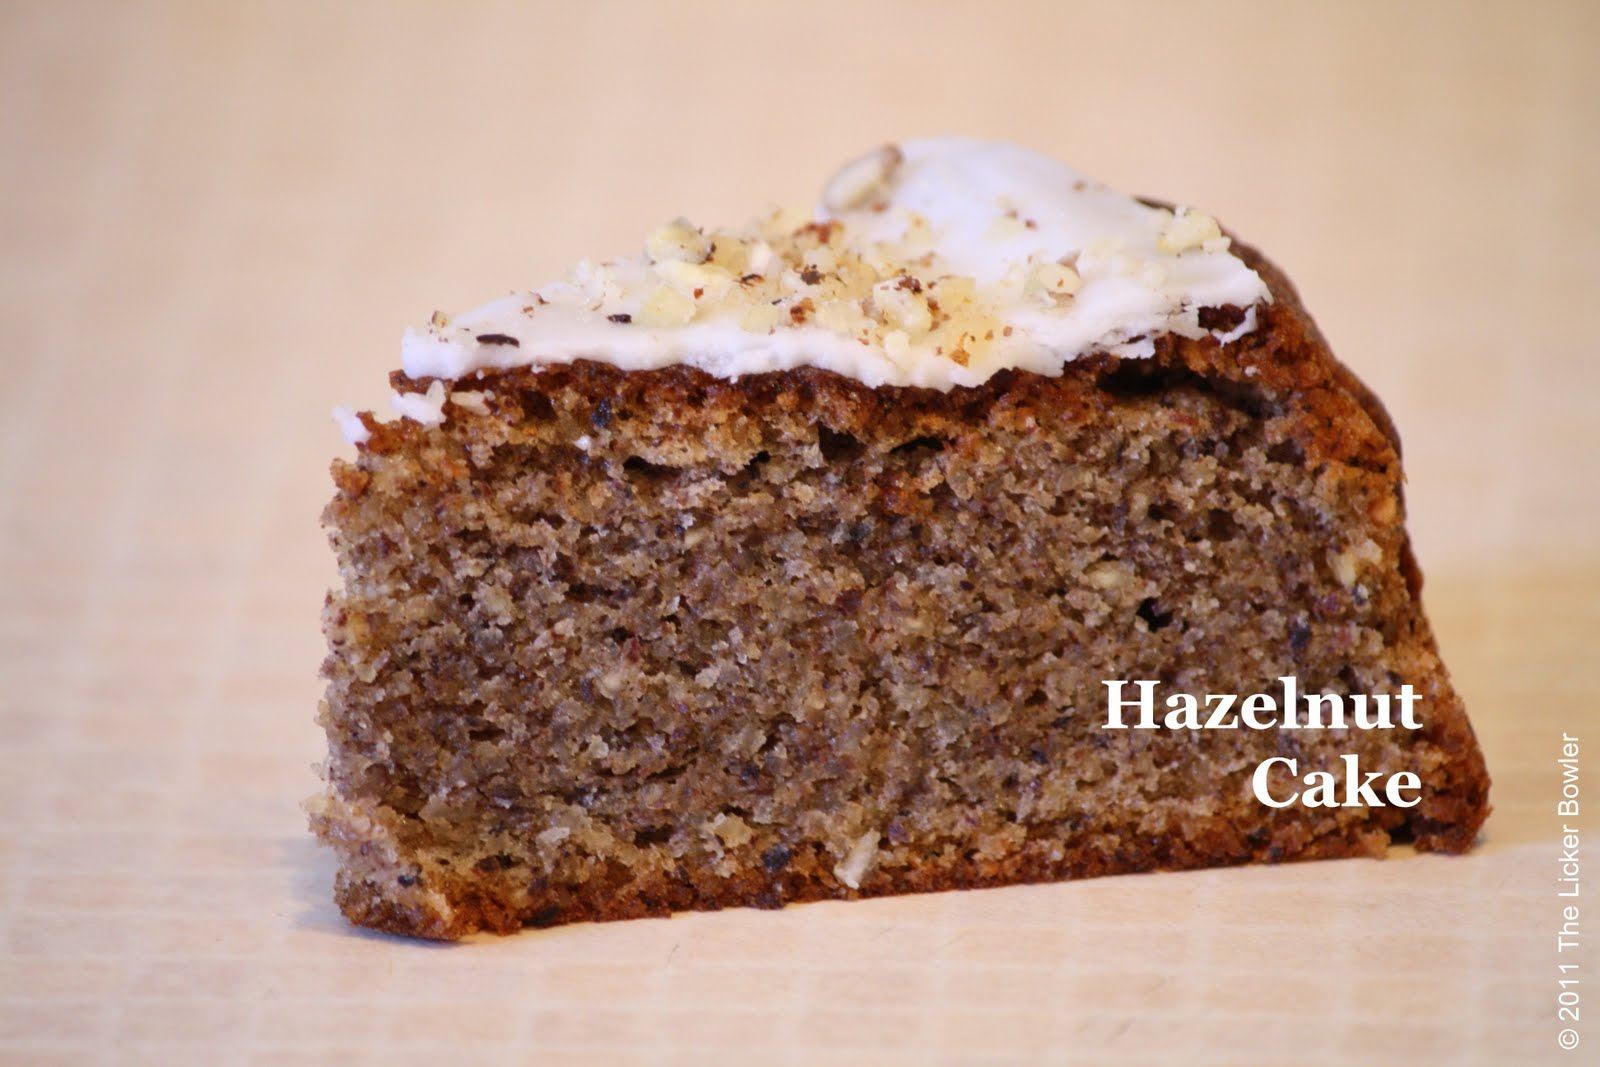 Hazelnut Cake Recipes Uk: The Licker Bowler